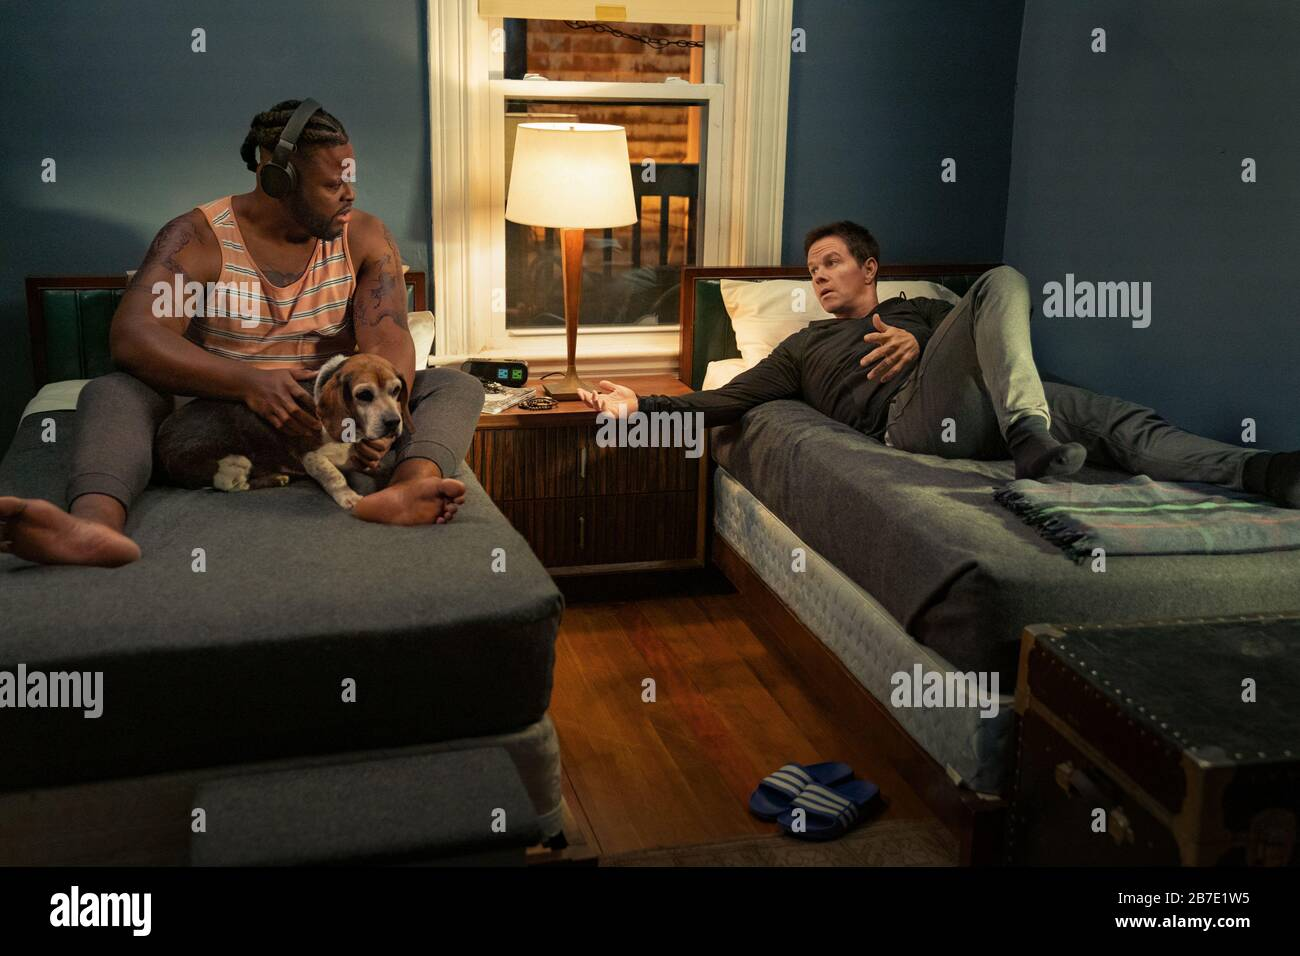 Winston Duke Mark Wahlberg Spenser Confidential 2020 Credit Daniel Mcfadden Netflix The Hollywood Archive Stock Photo Alamy